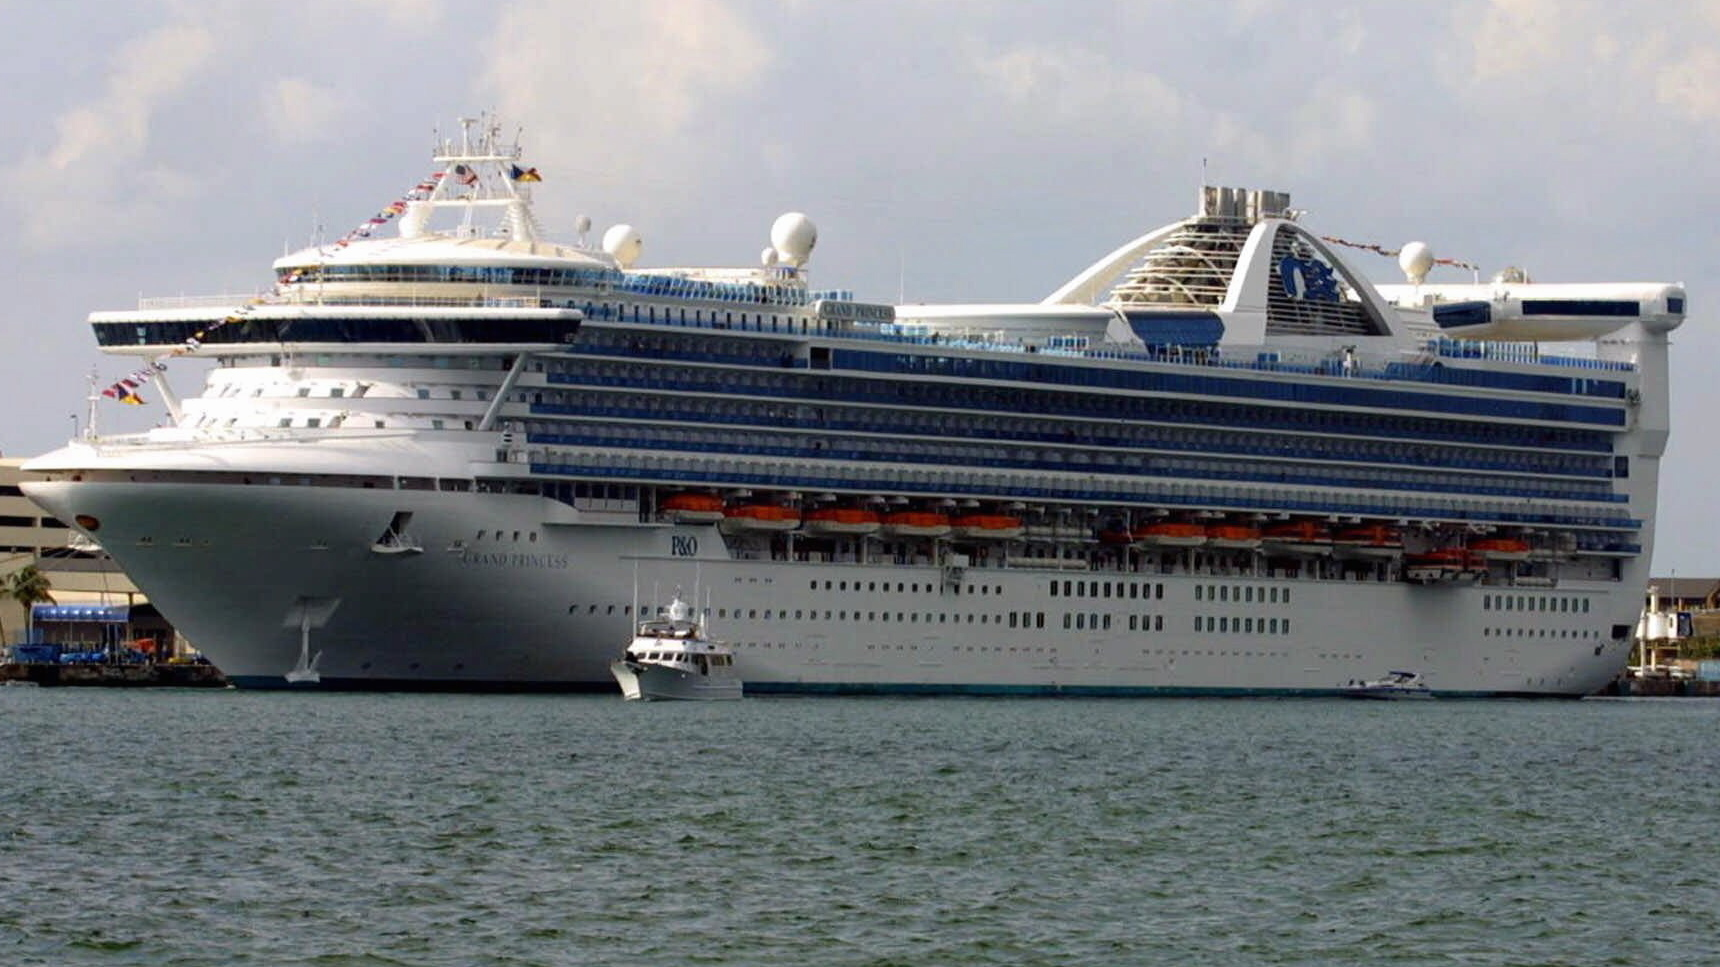 Coronavirus: Grand Princess Cruise Ship In Limbo After Former ...